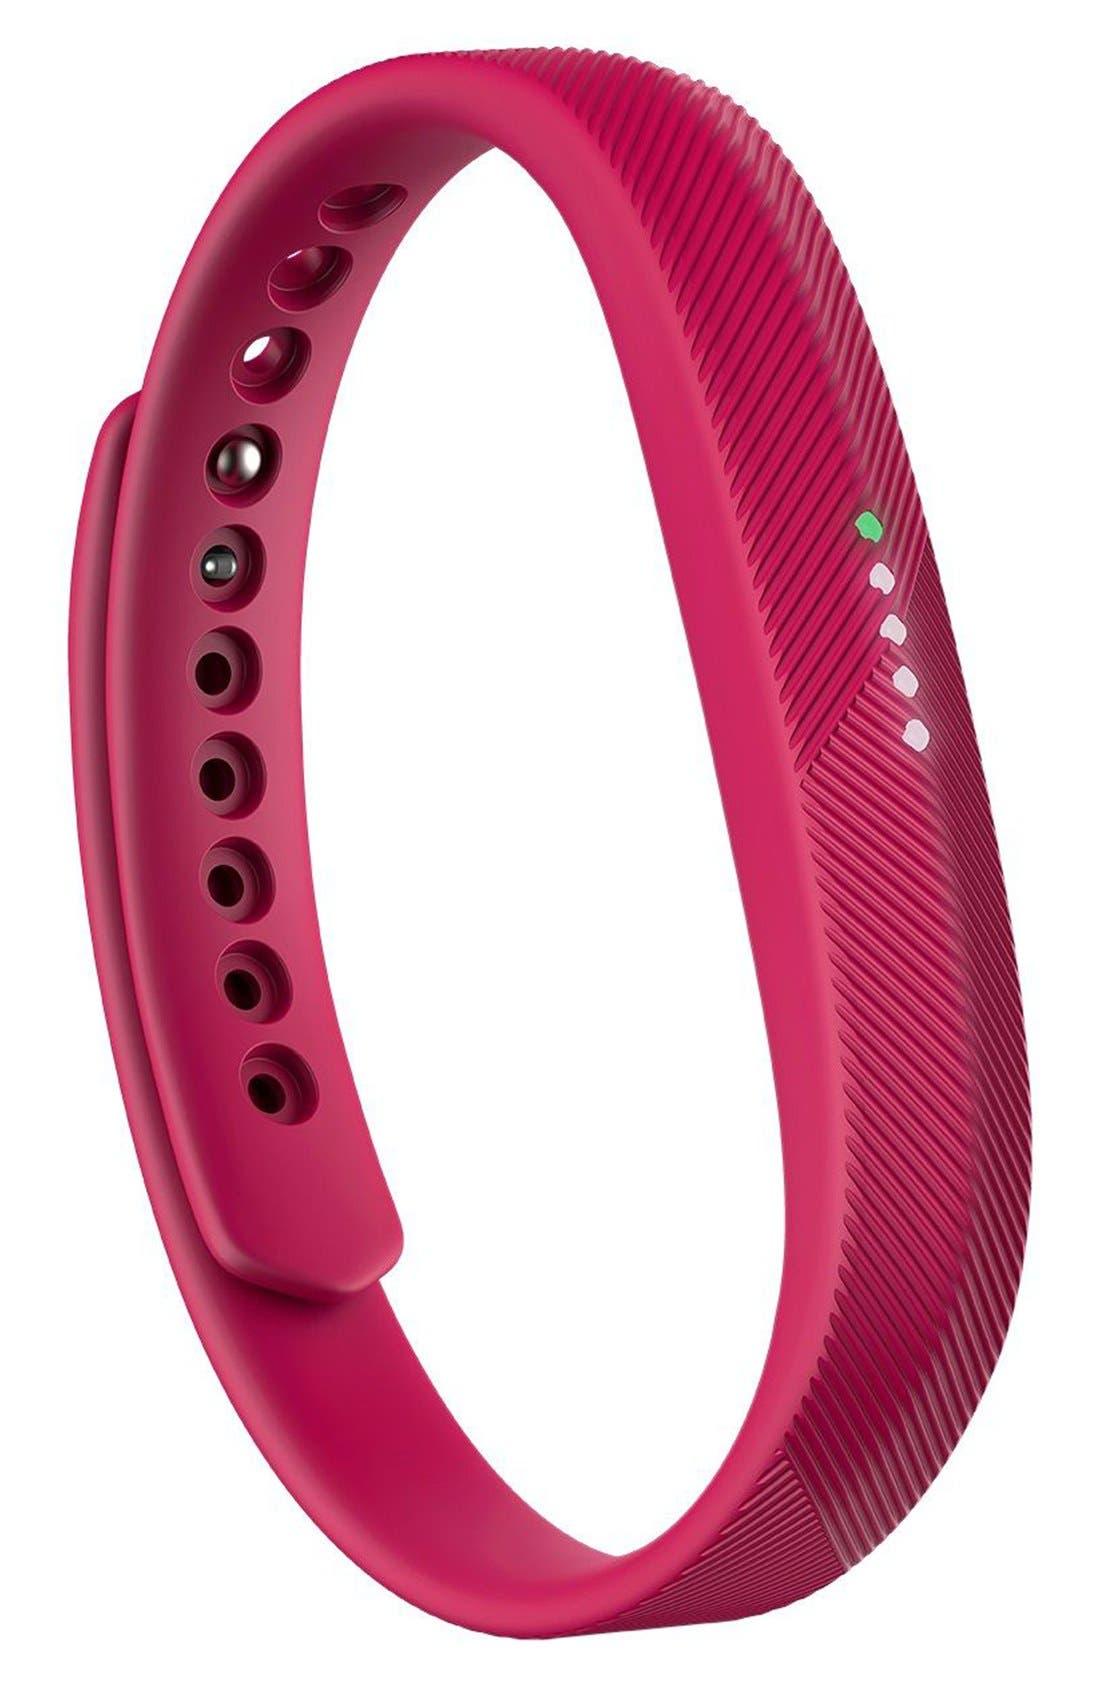 Fitbit 'Flex 2' Wireless Activity & Sleep Wristband